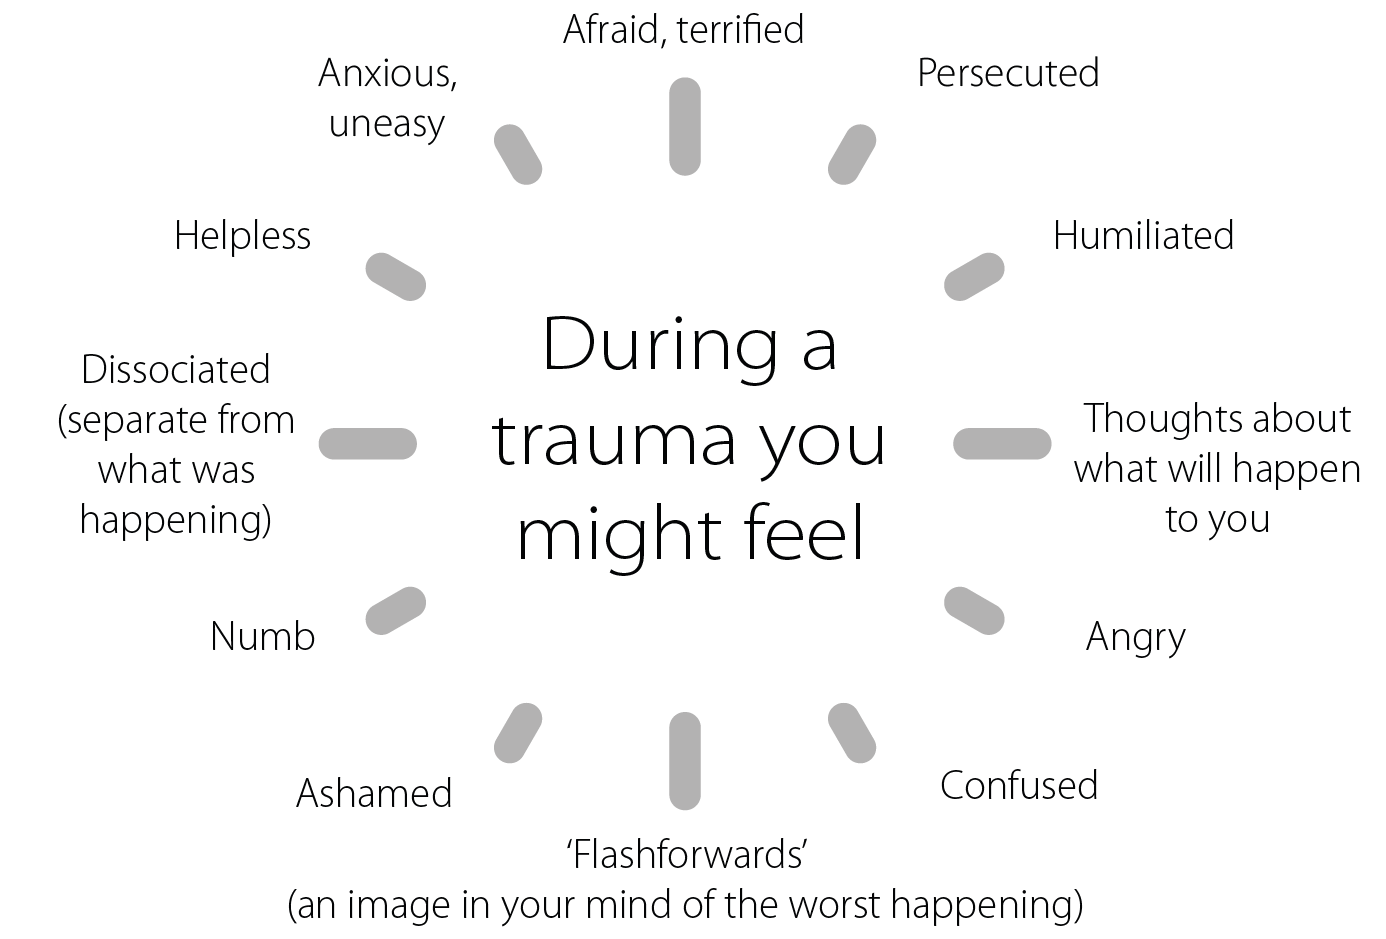 Symptoms you might feel during a trauma